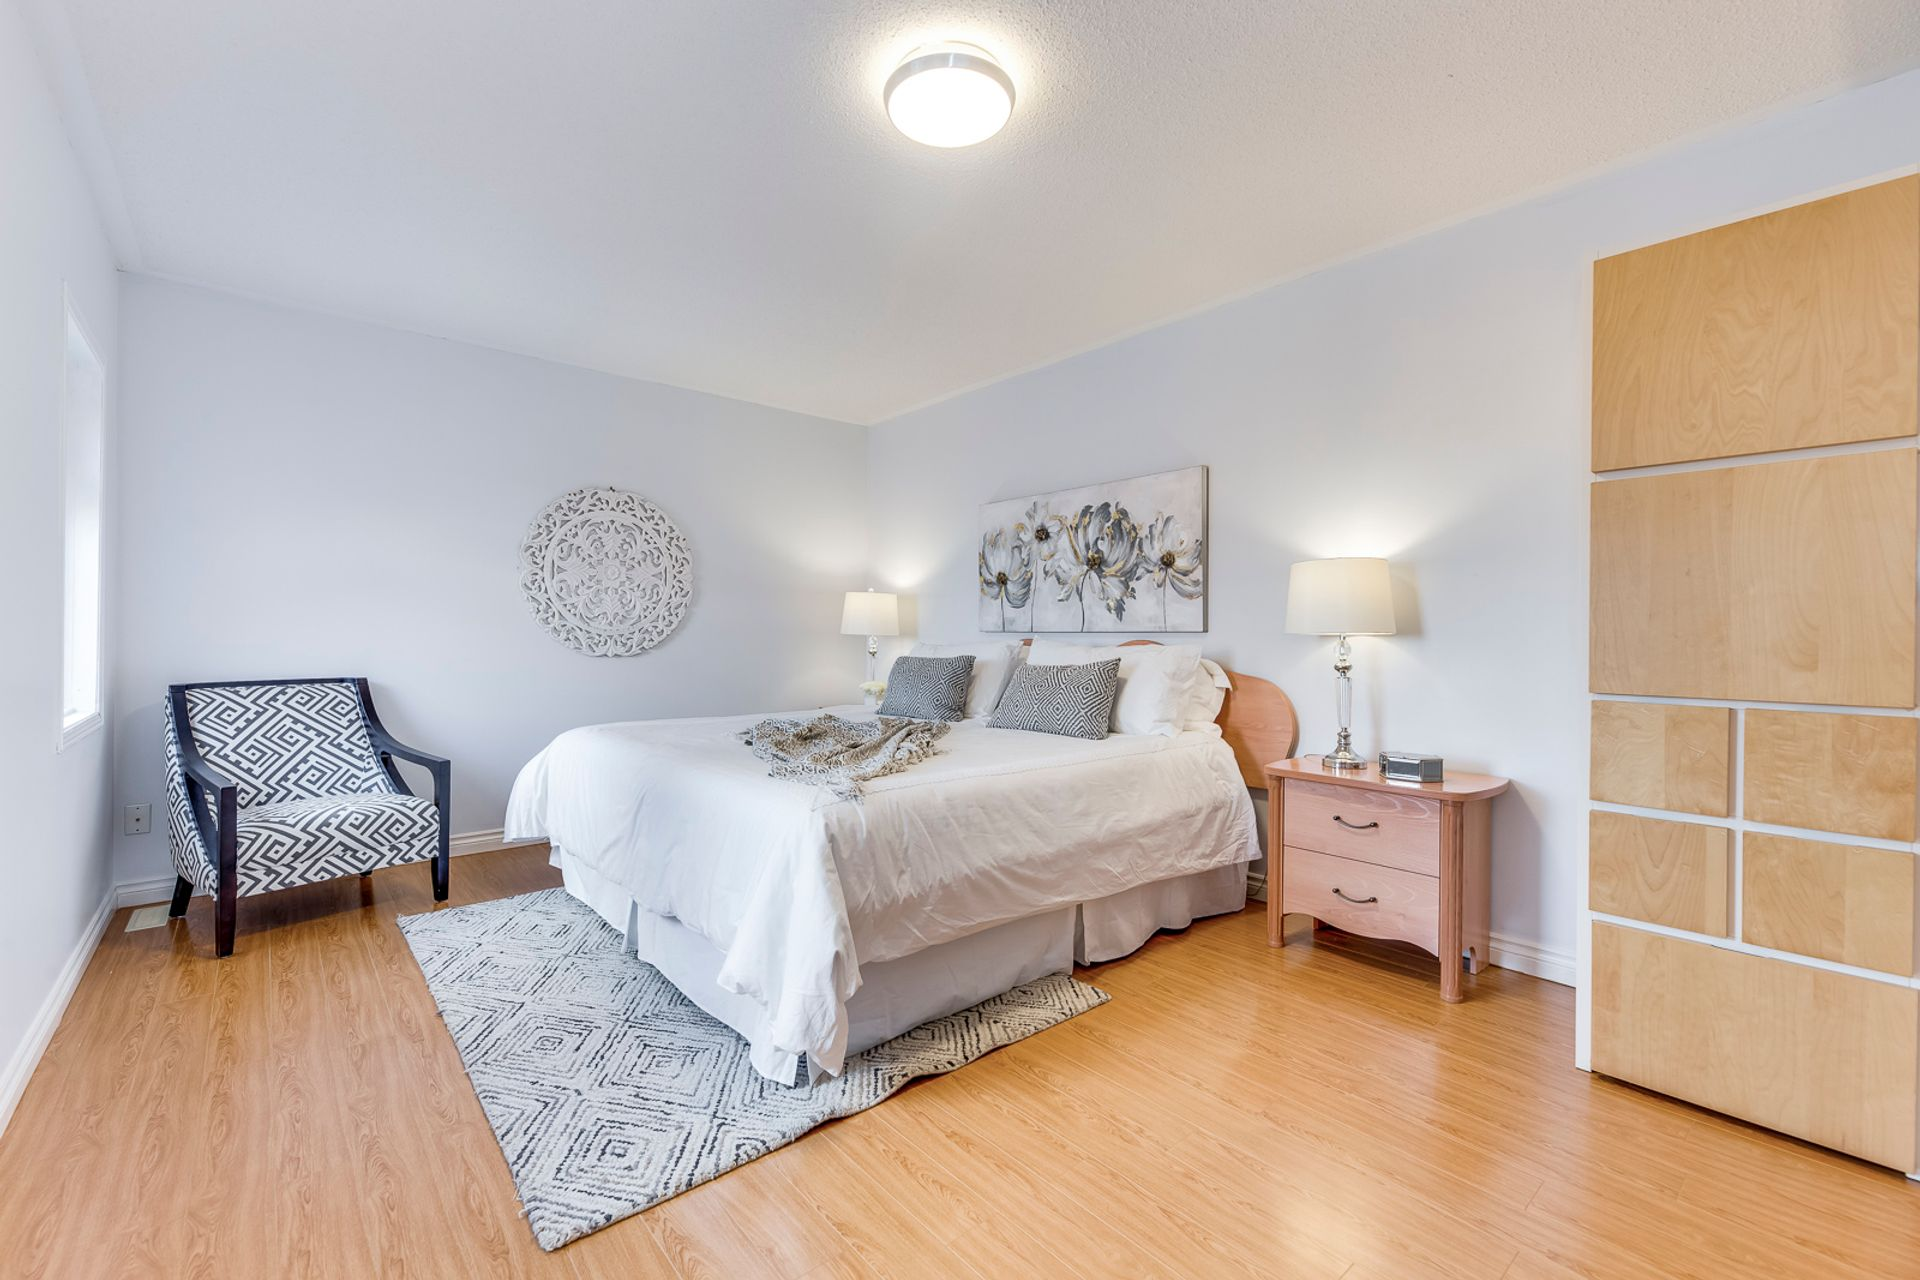 Primary Bedroom - 200 Lexington Rd, Oakville - Elite3 & Team at 200 Lexington Road, River Oaks, Oakville